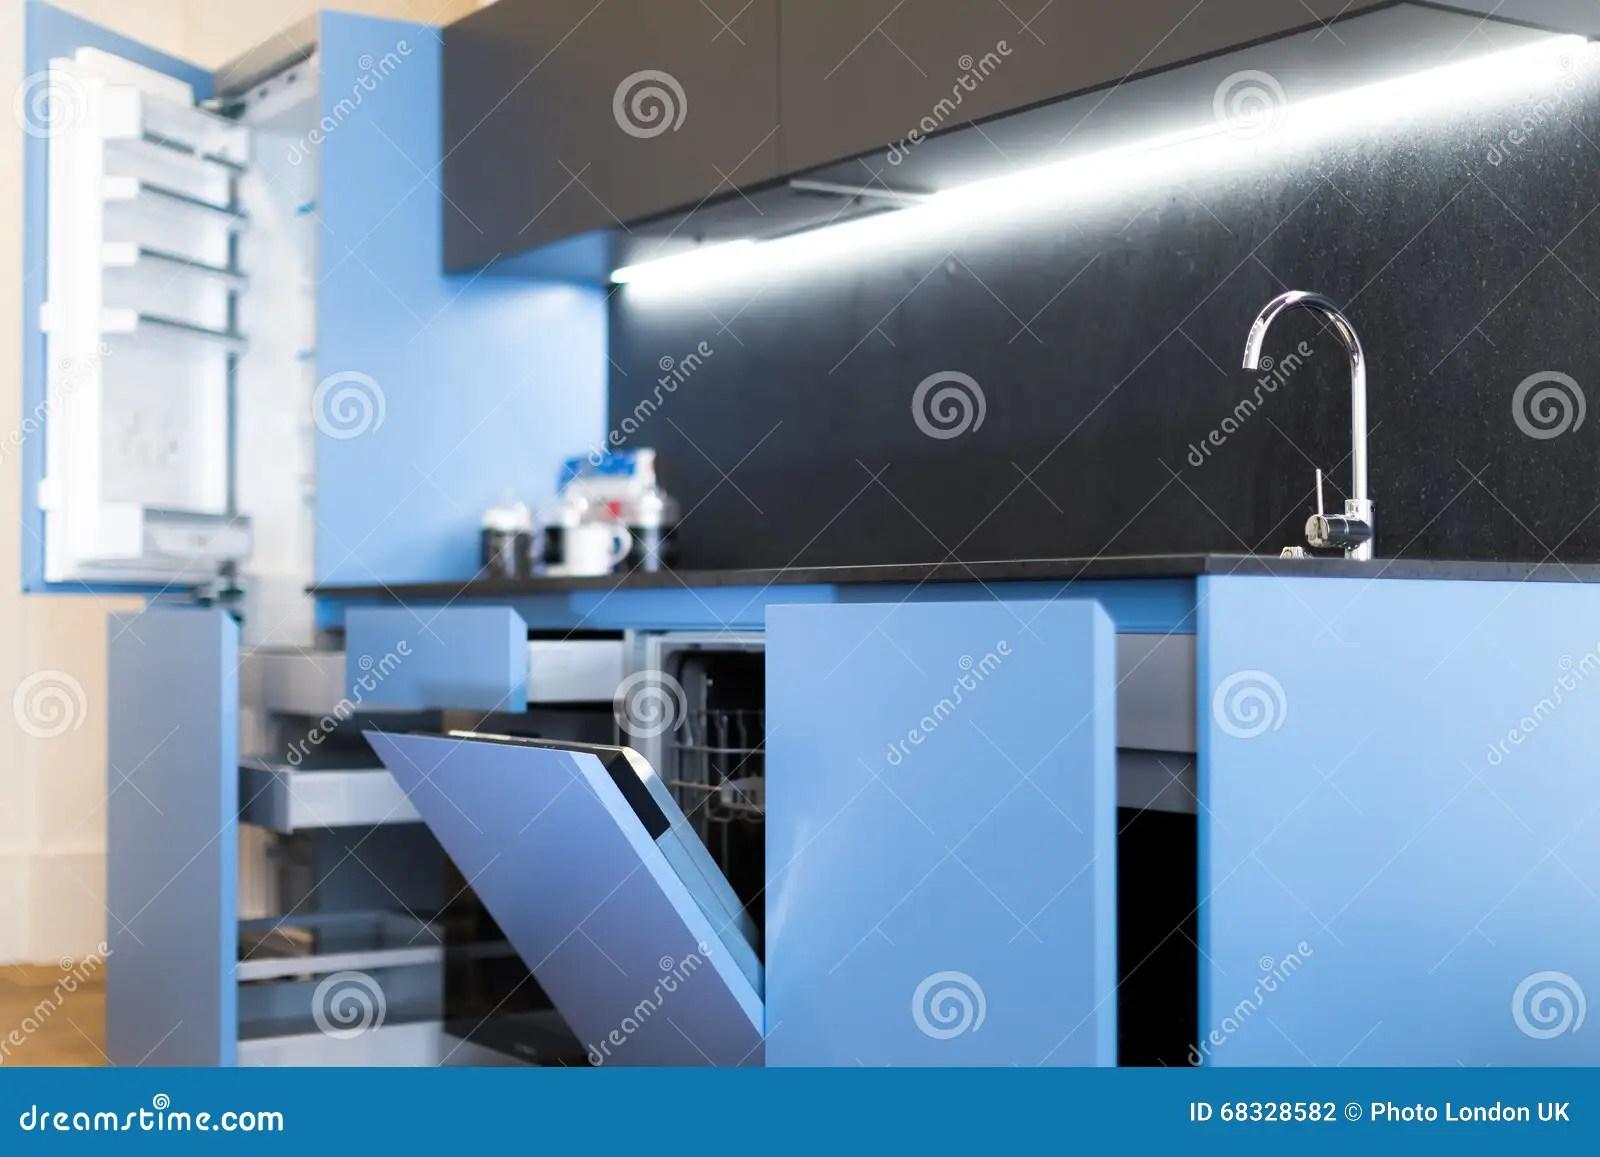 kitchen aid dishwashers 48 sink base cabinet 适合的厨房洗碗机和抽屉库存照片 图片包括有内部 国内 典雅 干净 蓝色适合的厨房洗碗机和抽屉打开